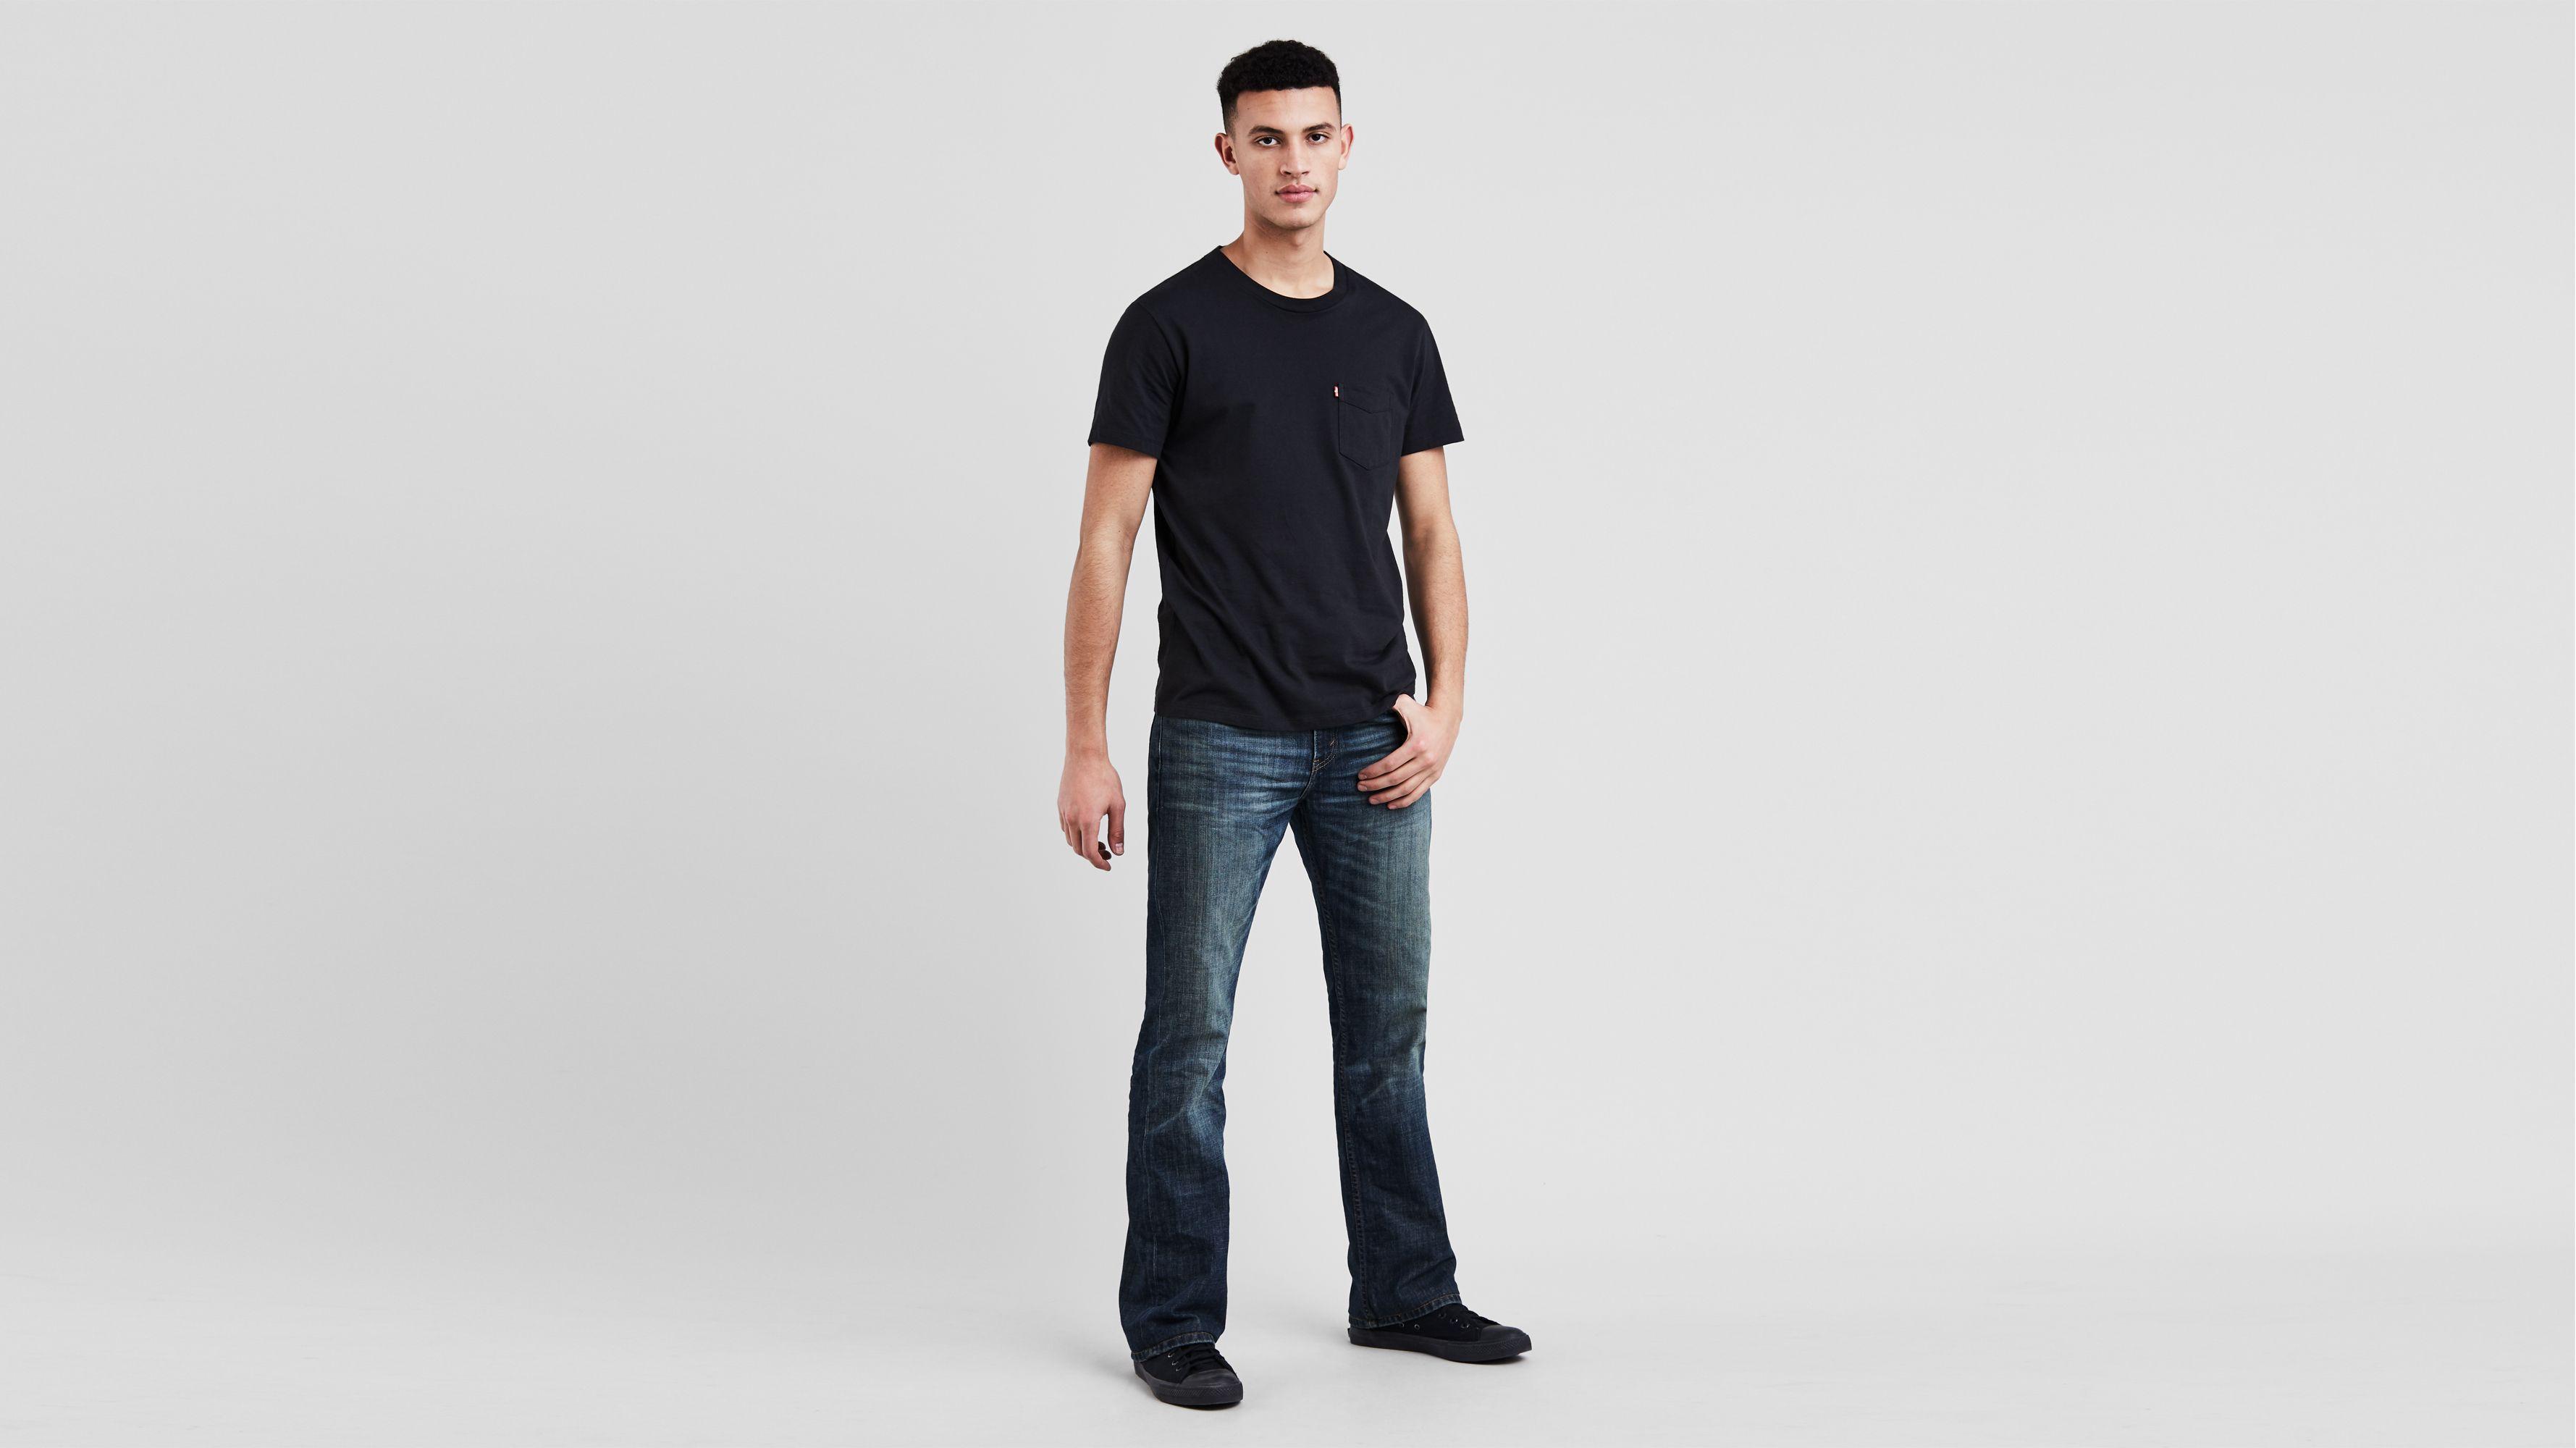 Boot US Jeans MenLevi's® 527 Cut Levi's® Shop for Slim FJlTKc1